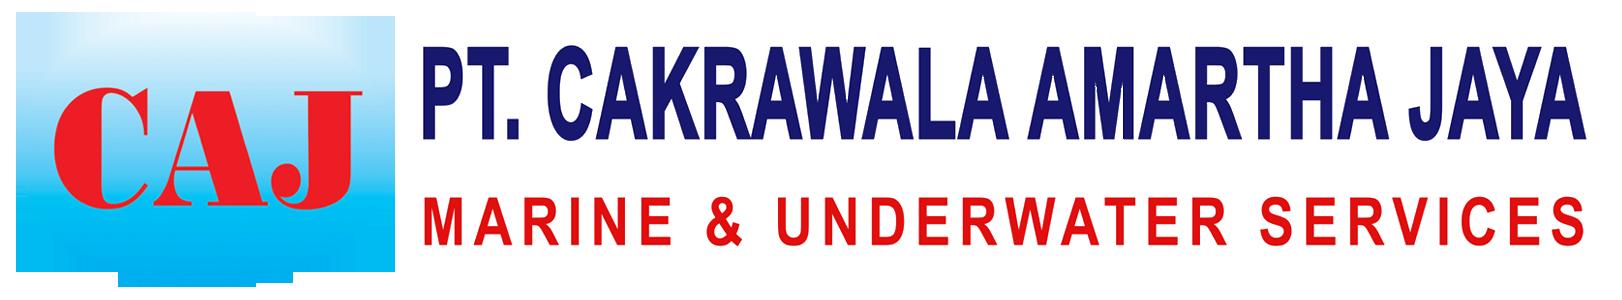 PT. CAKRAWALA AMARTHA JAYA || Underwater Service Indonesia